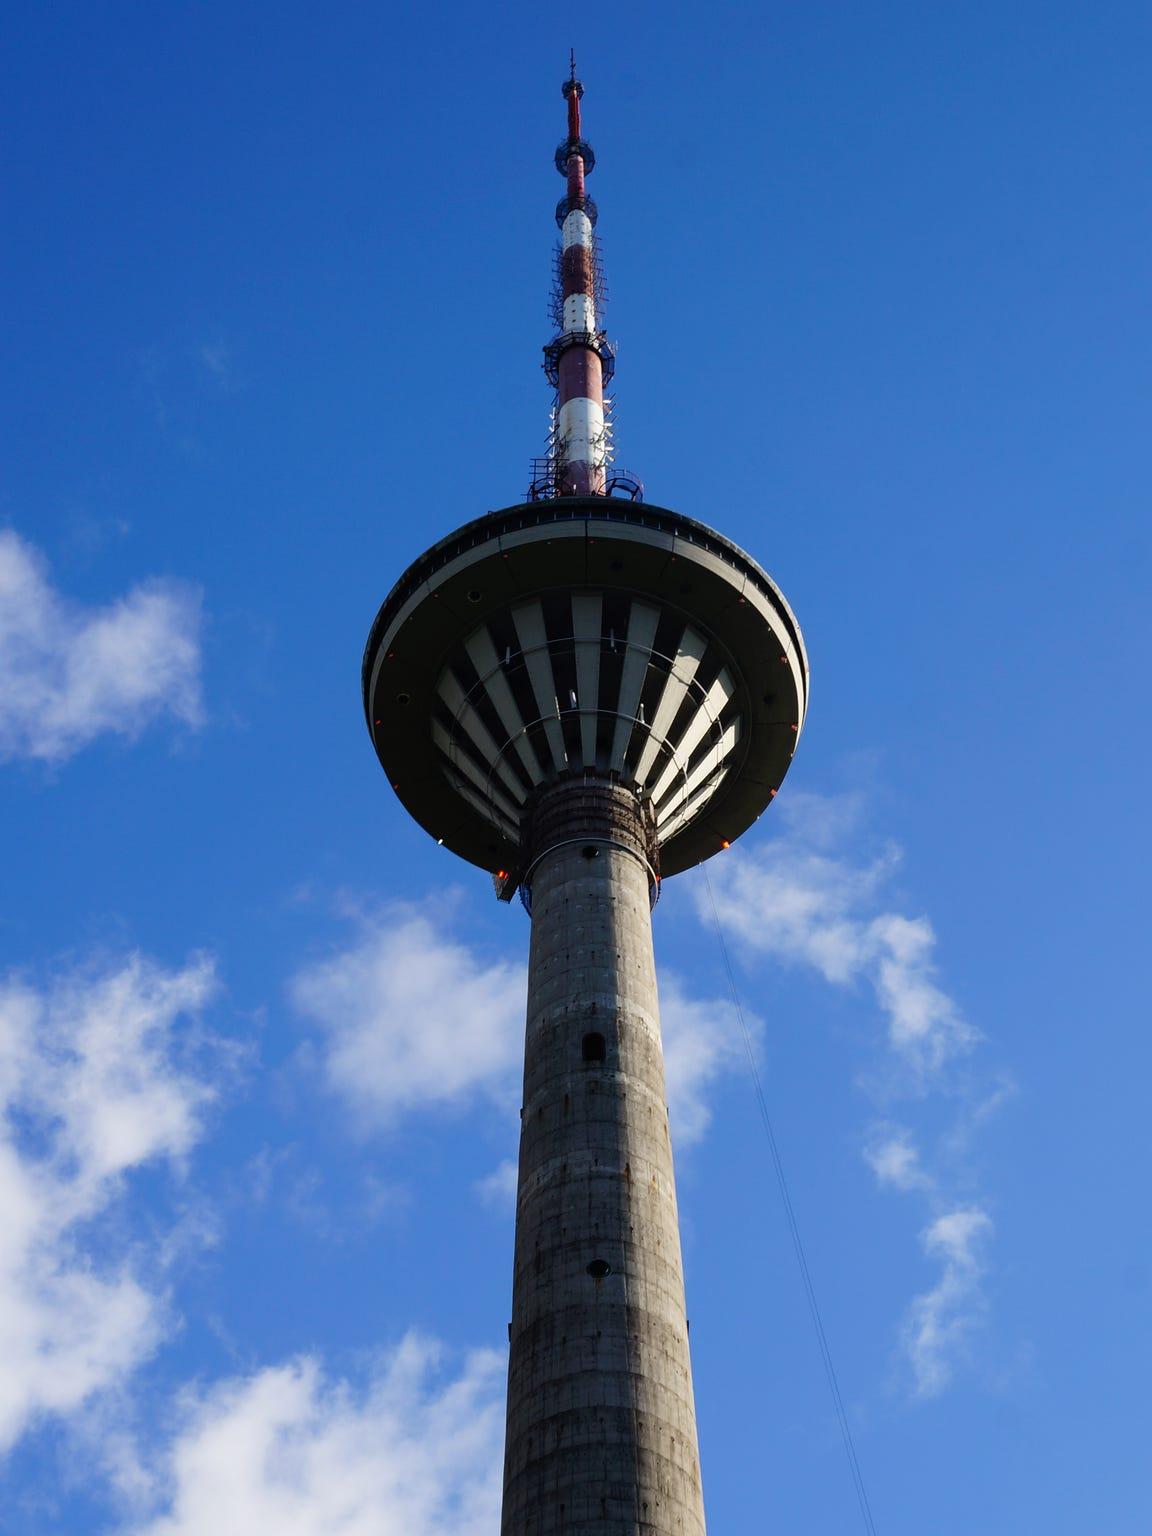 Tallinna Teletorn, or Tallinn TV Tower, is Estonia's